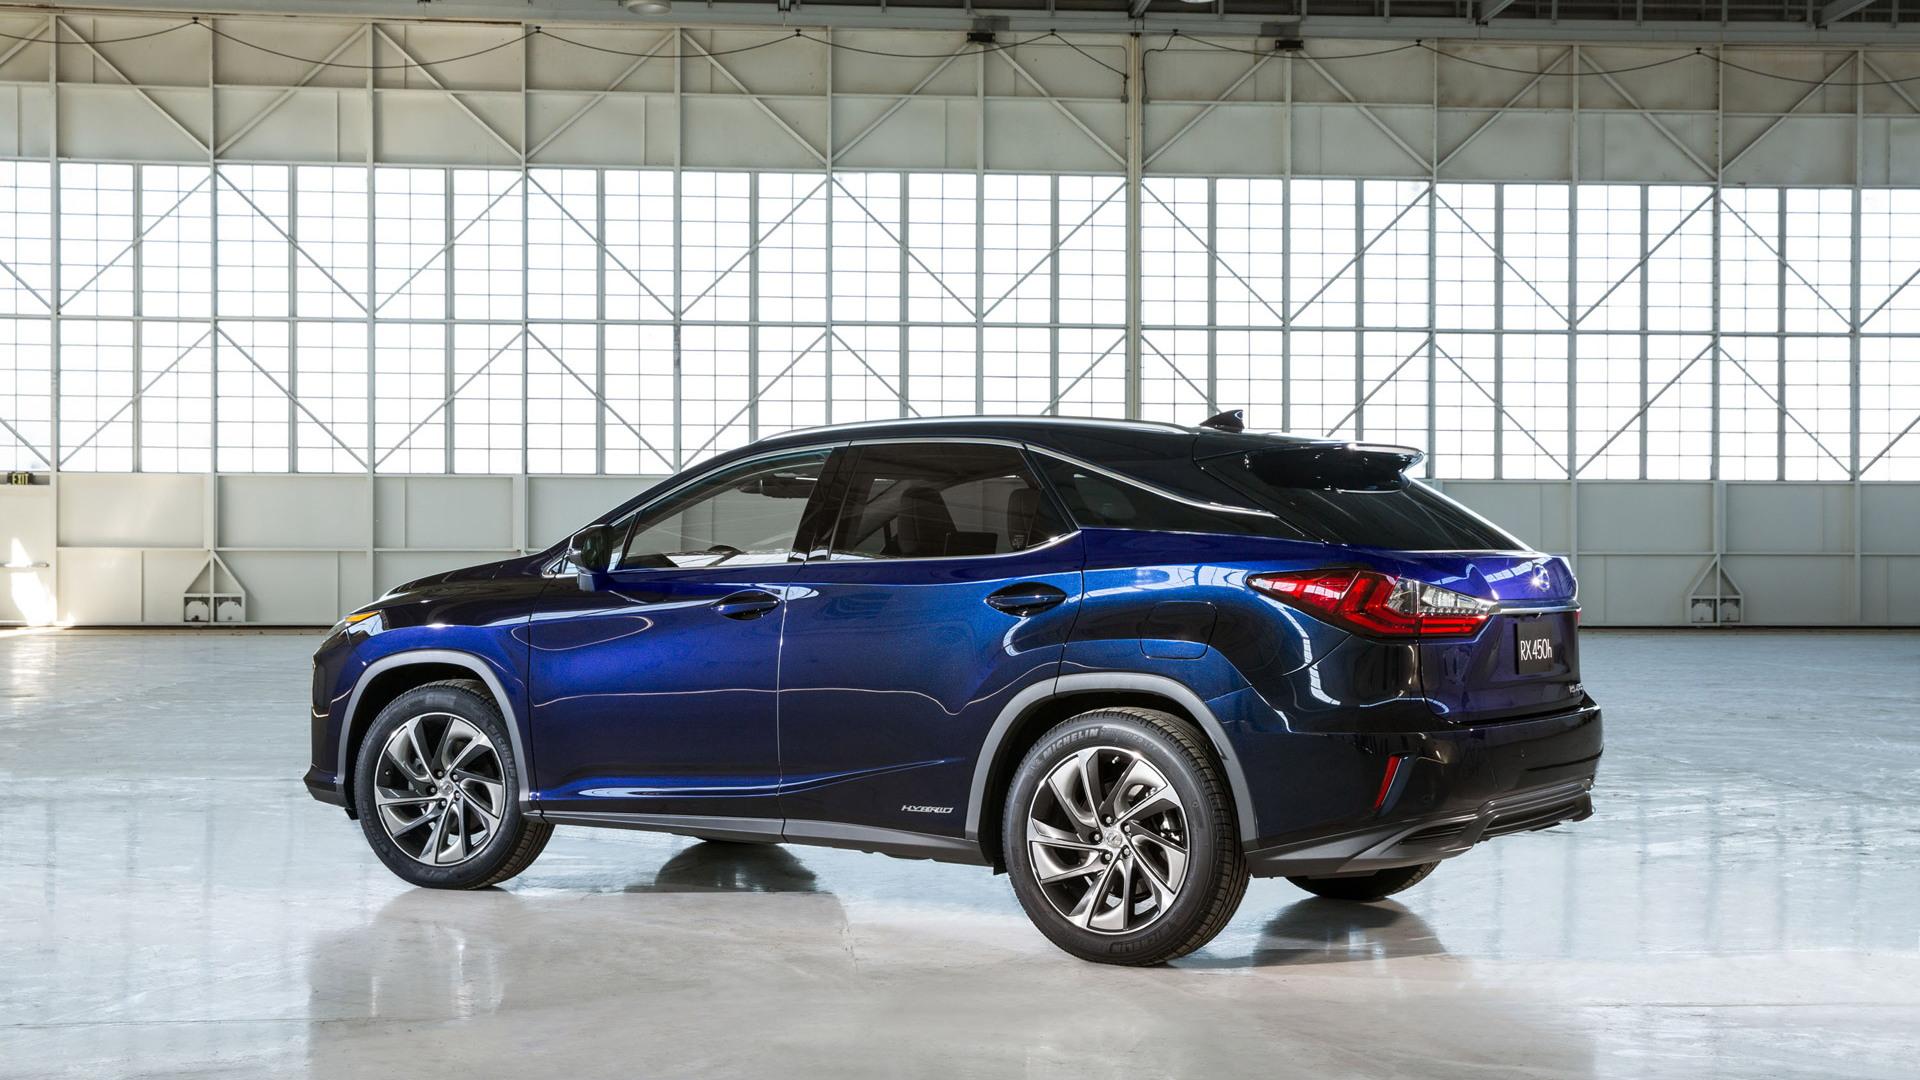 2016 Lexus RX 450h Hybrid Unveiled At New York Auto Show